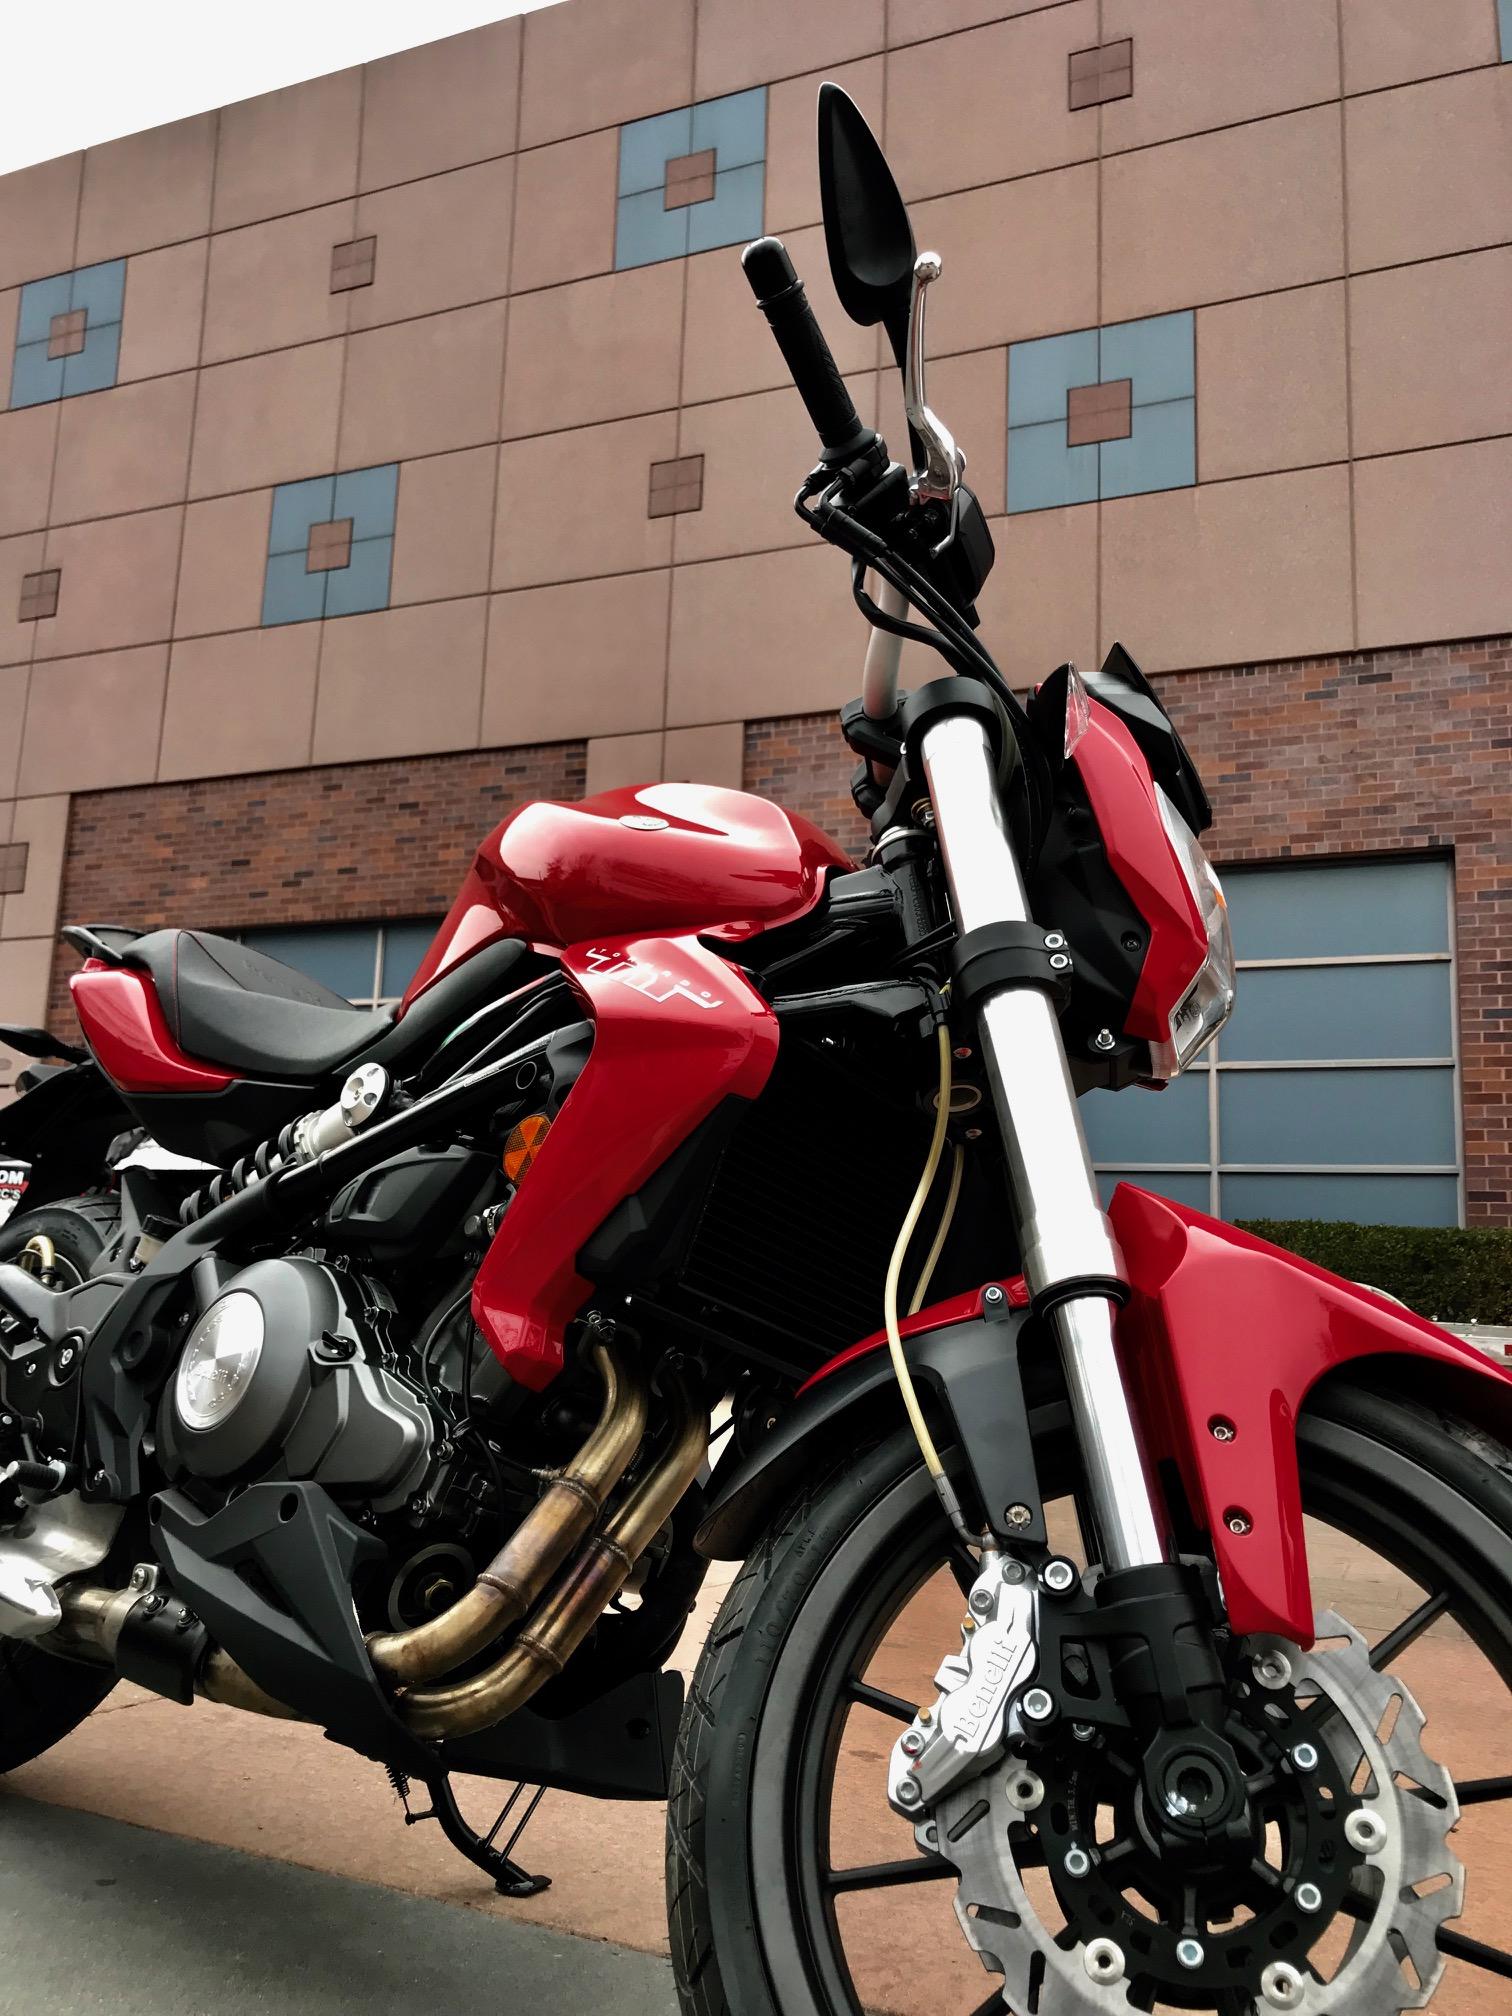 MotorcycleShow_49